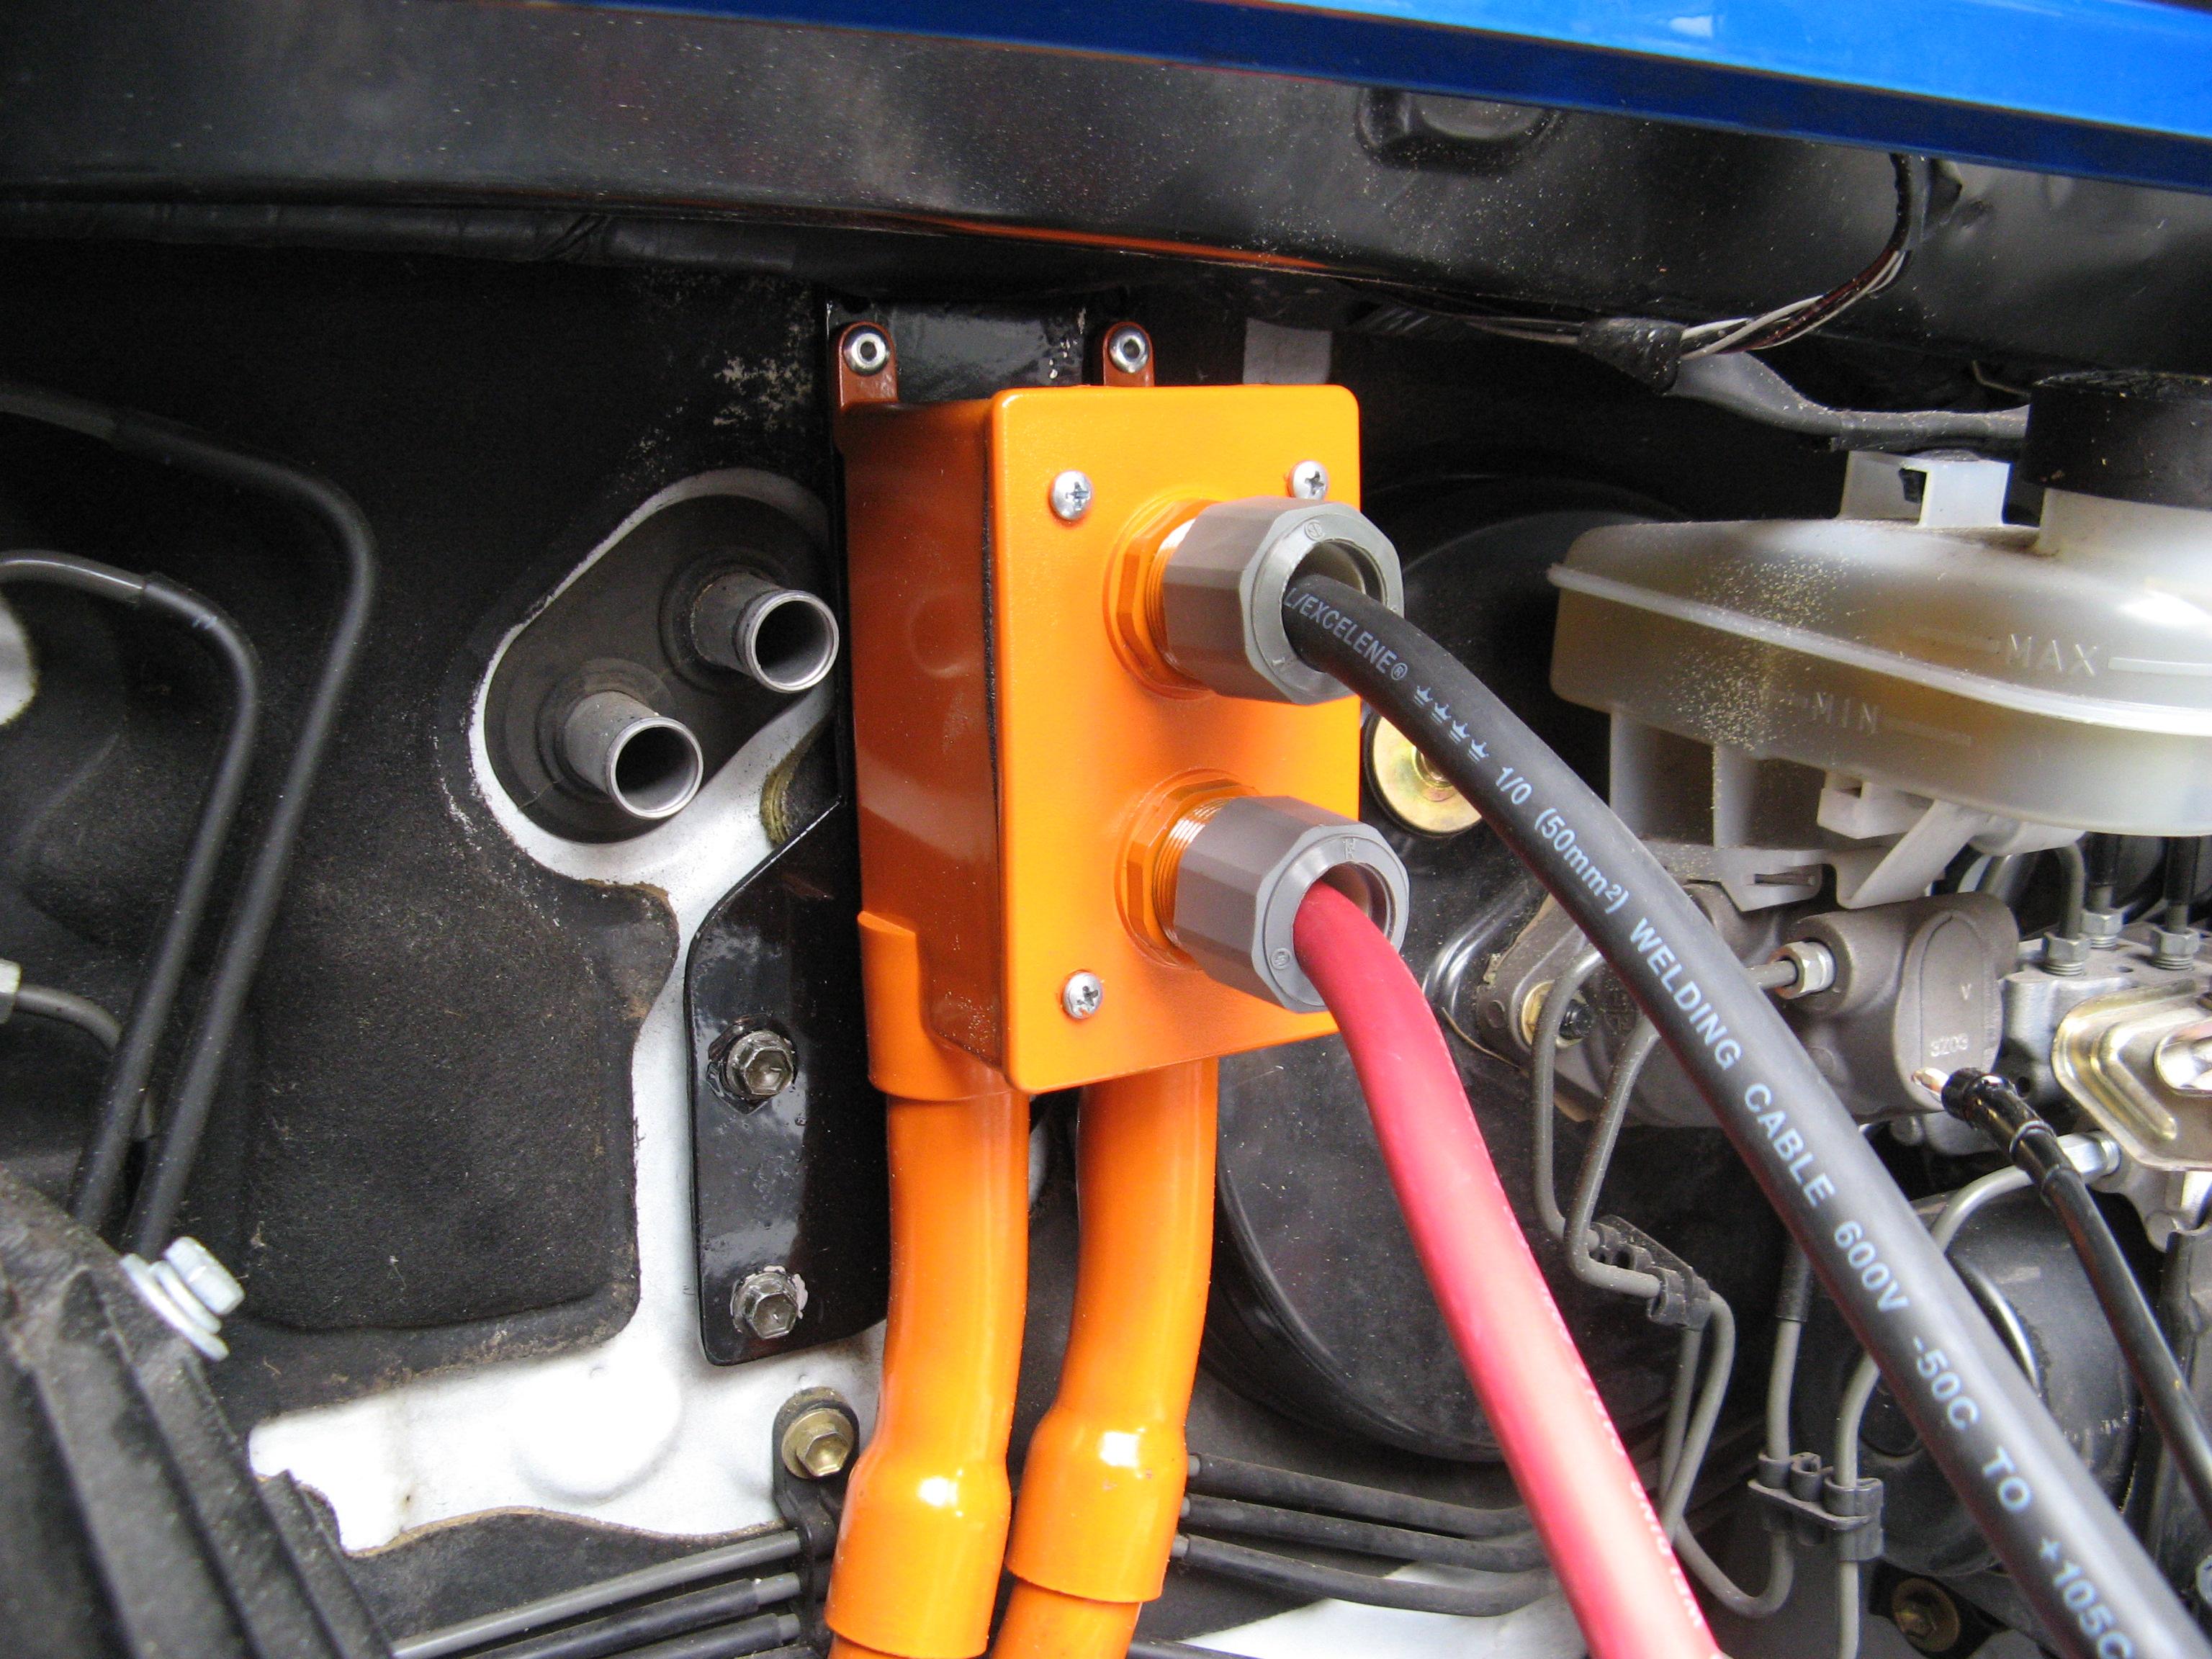 Scion Xb Ev Battery Boxes And High Voltage Conduit